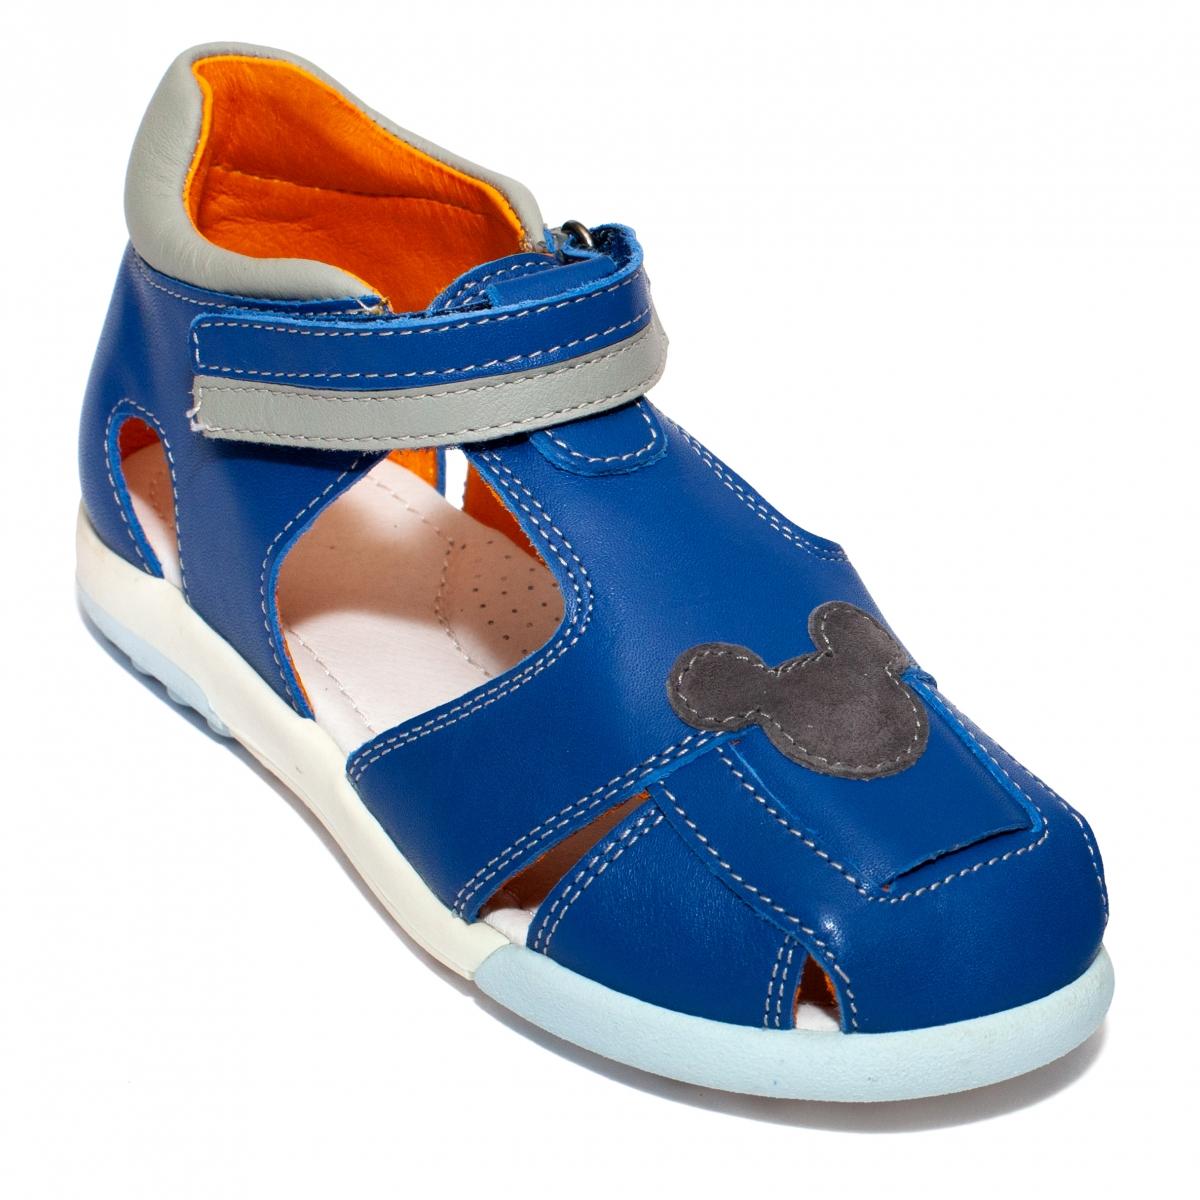 Sandalute baieti avus din piele AV22 albastru gri miky 20-30